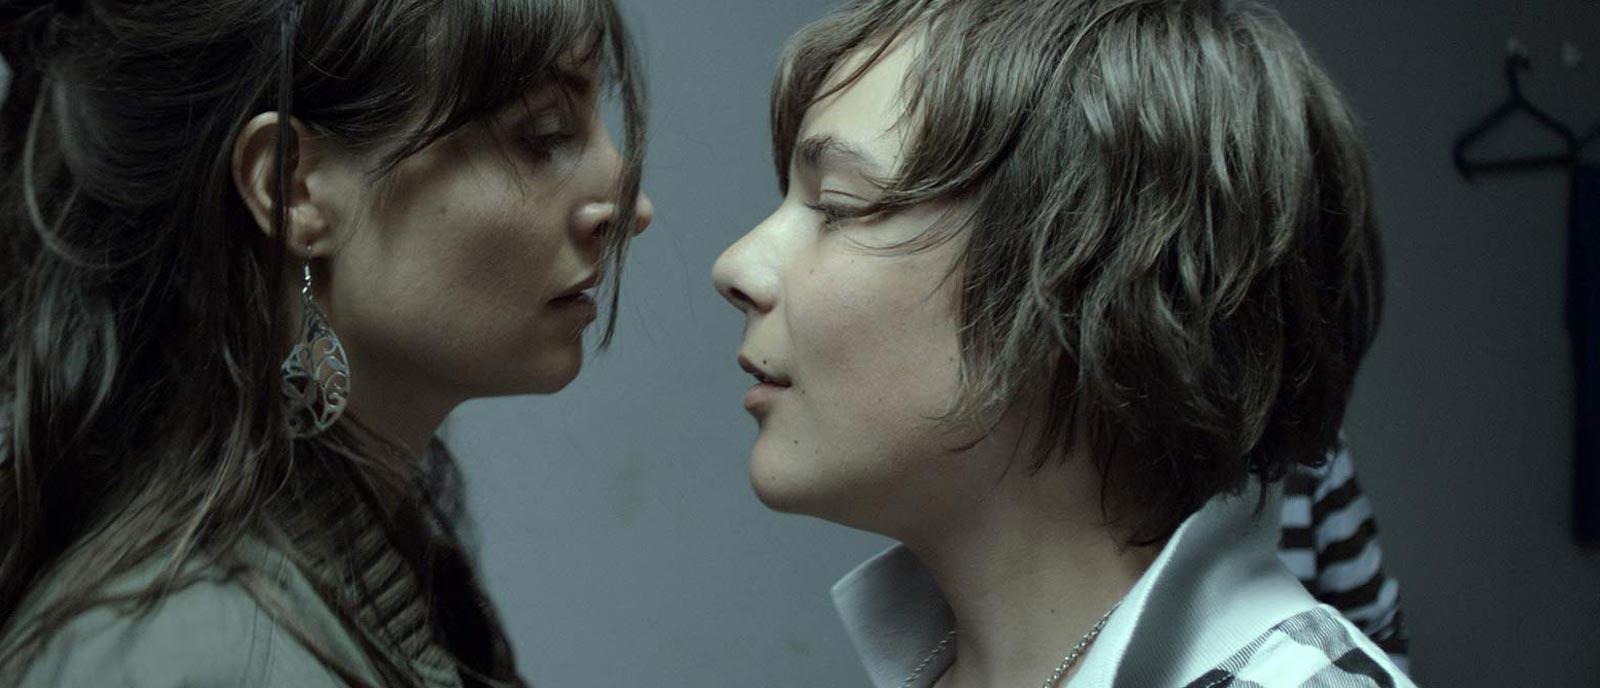 Lisa Violetta Gass Film gisberta